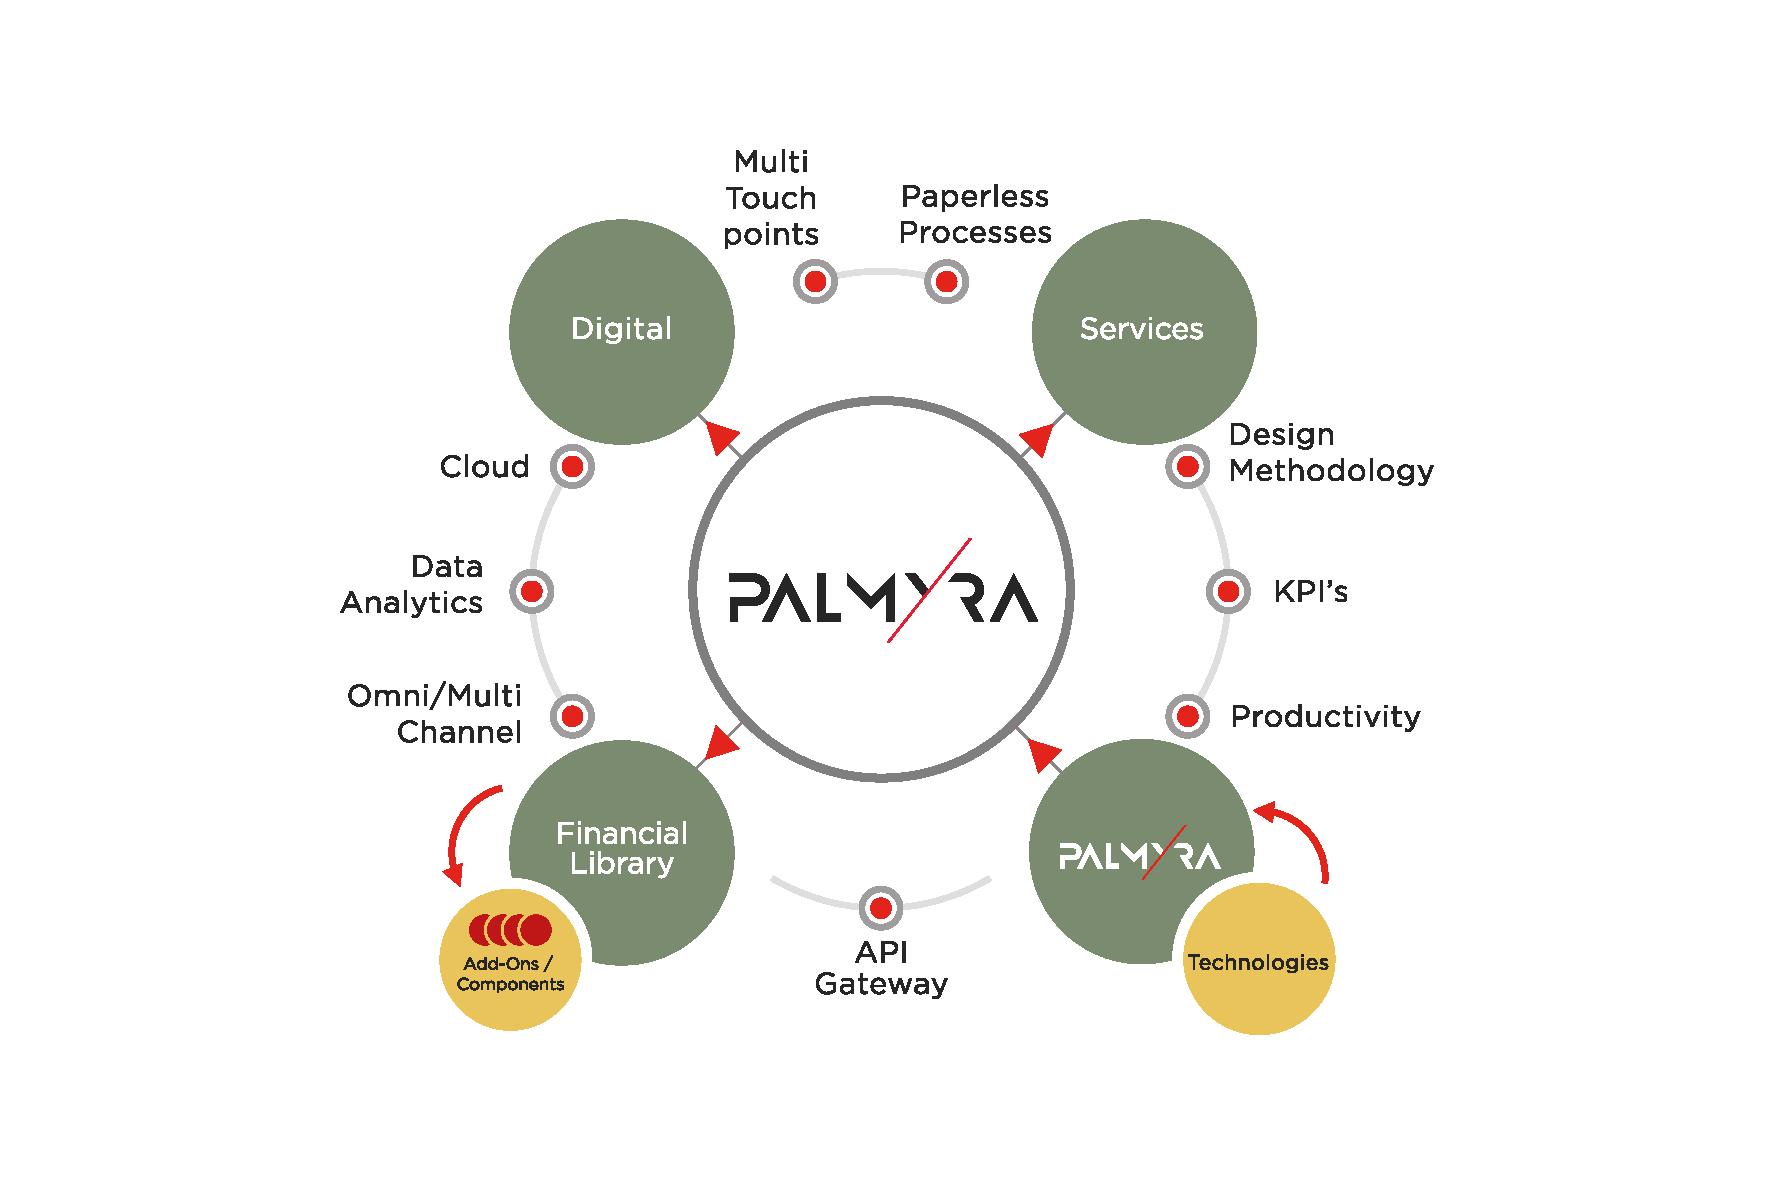 PALMYRA schémas